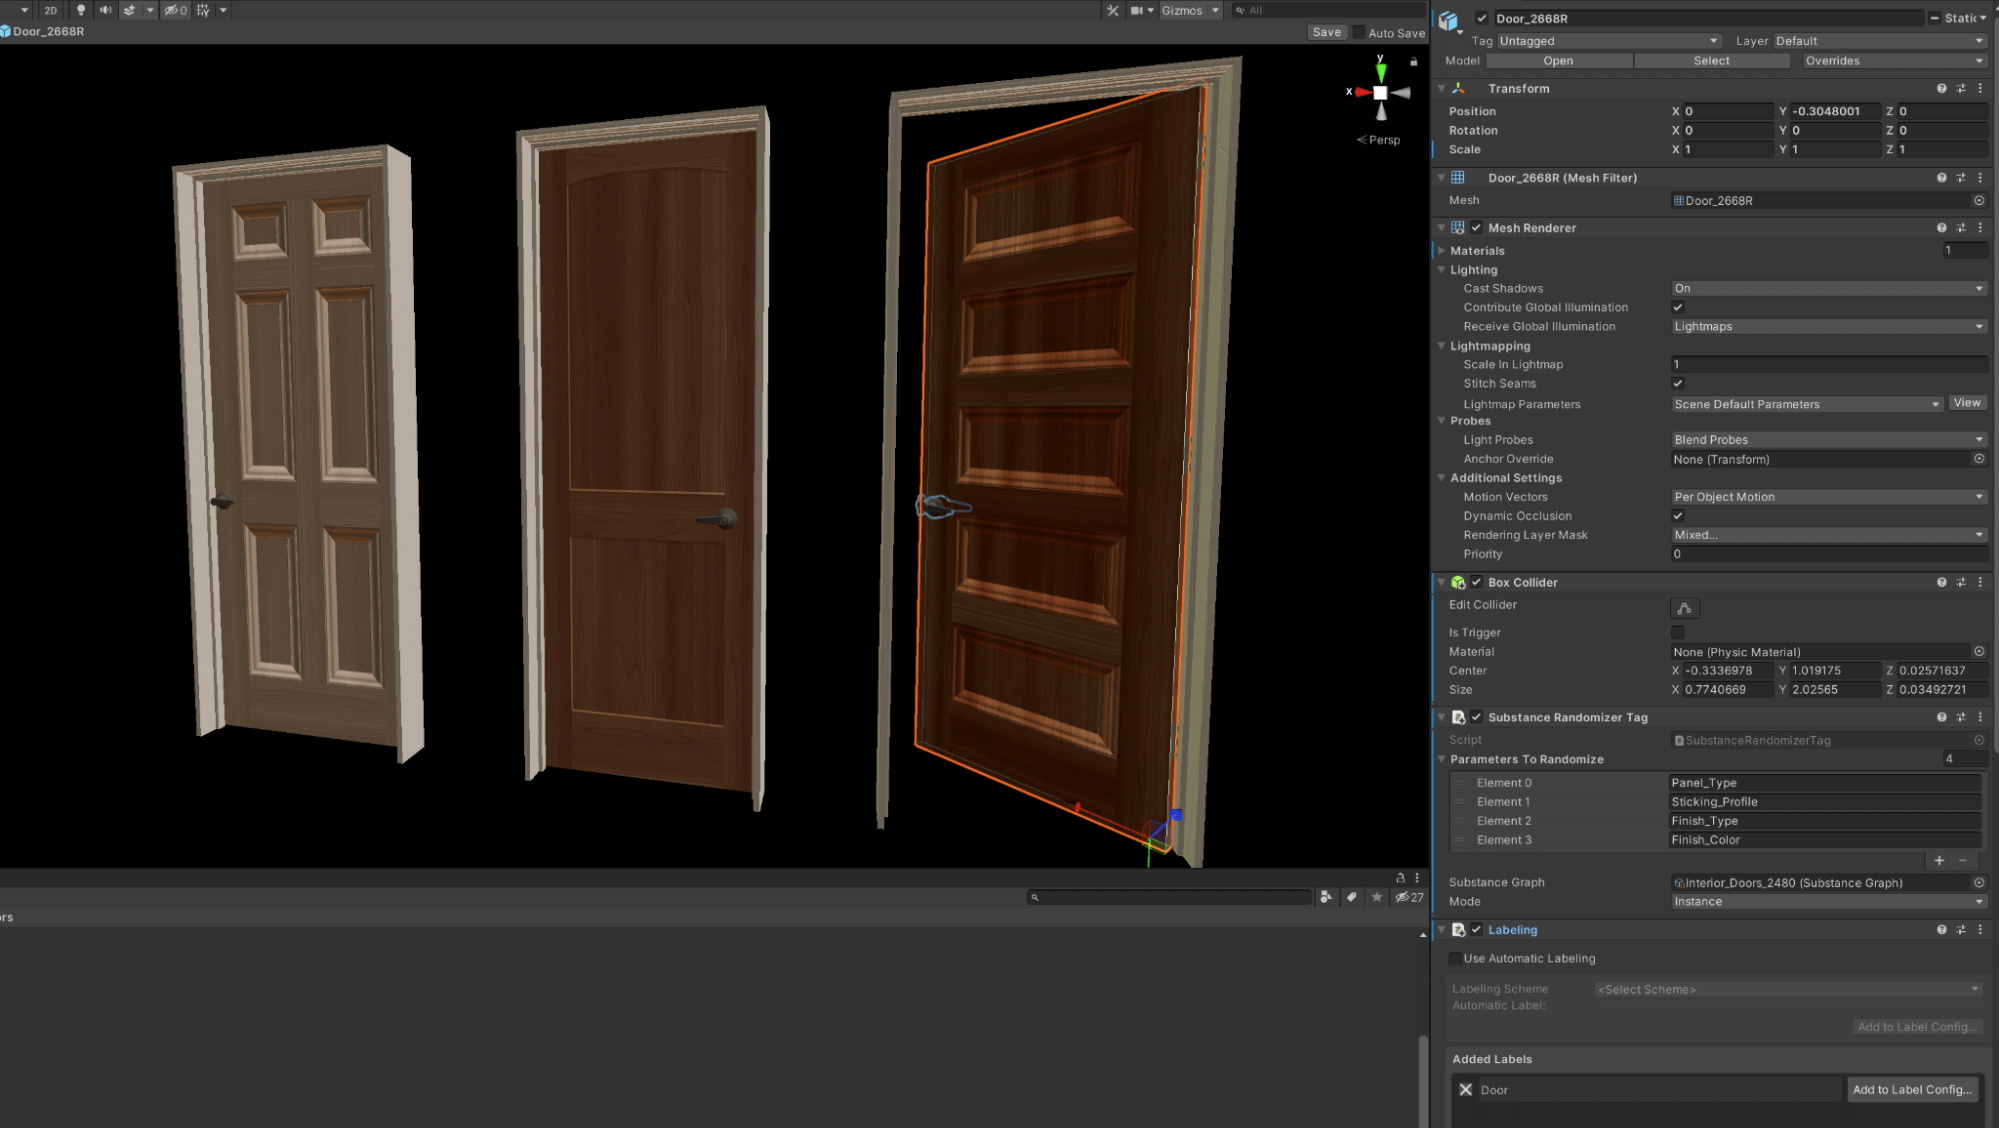 Door Prefab, showing components, materials, and randomization